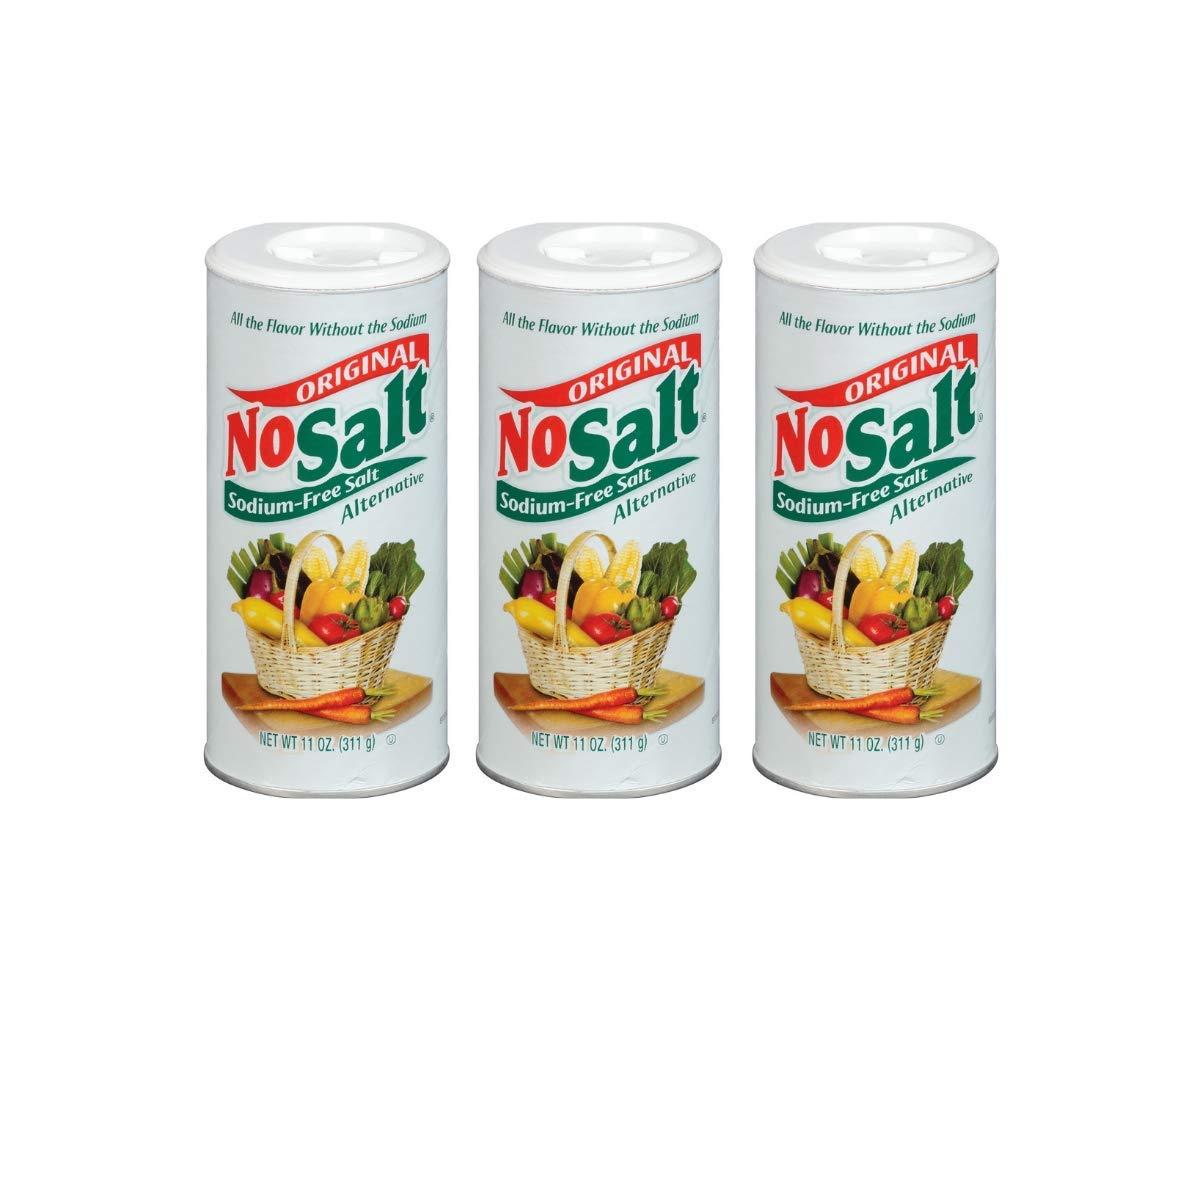 NoSalt Original Sodium-Free Salt Alternative (11oz Canister 3 pack)